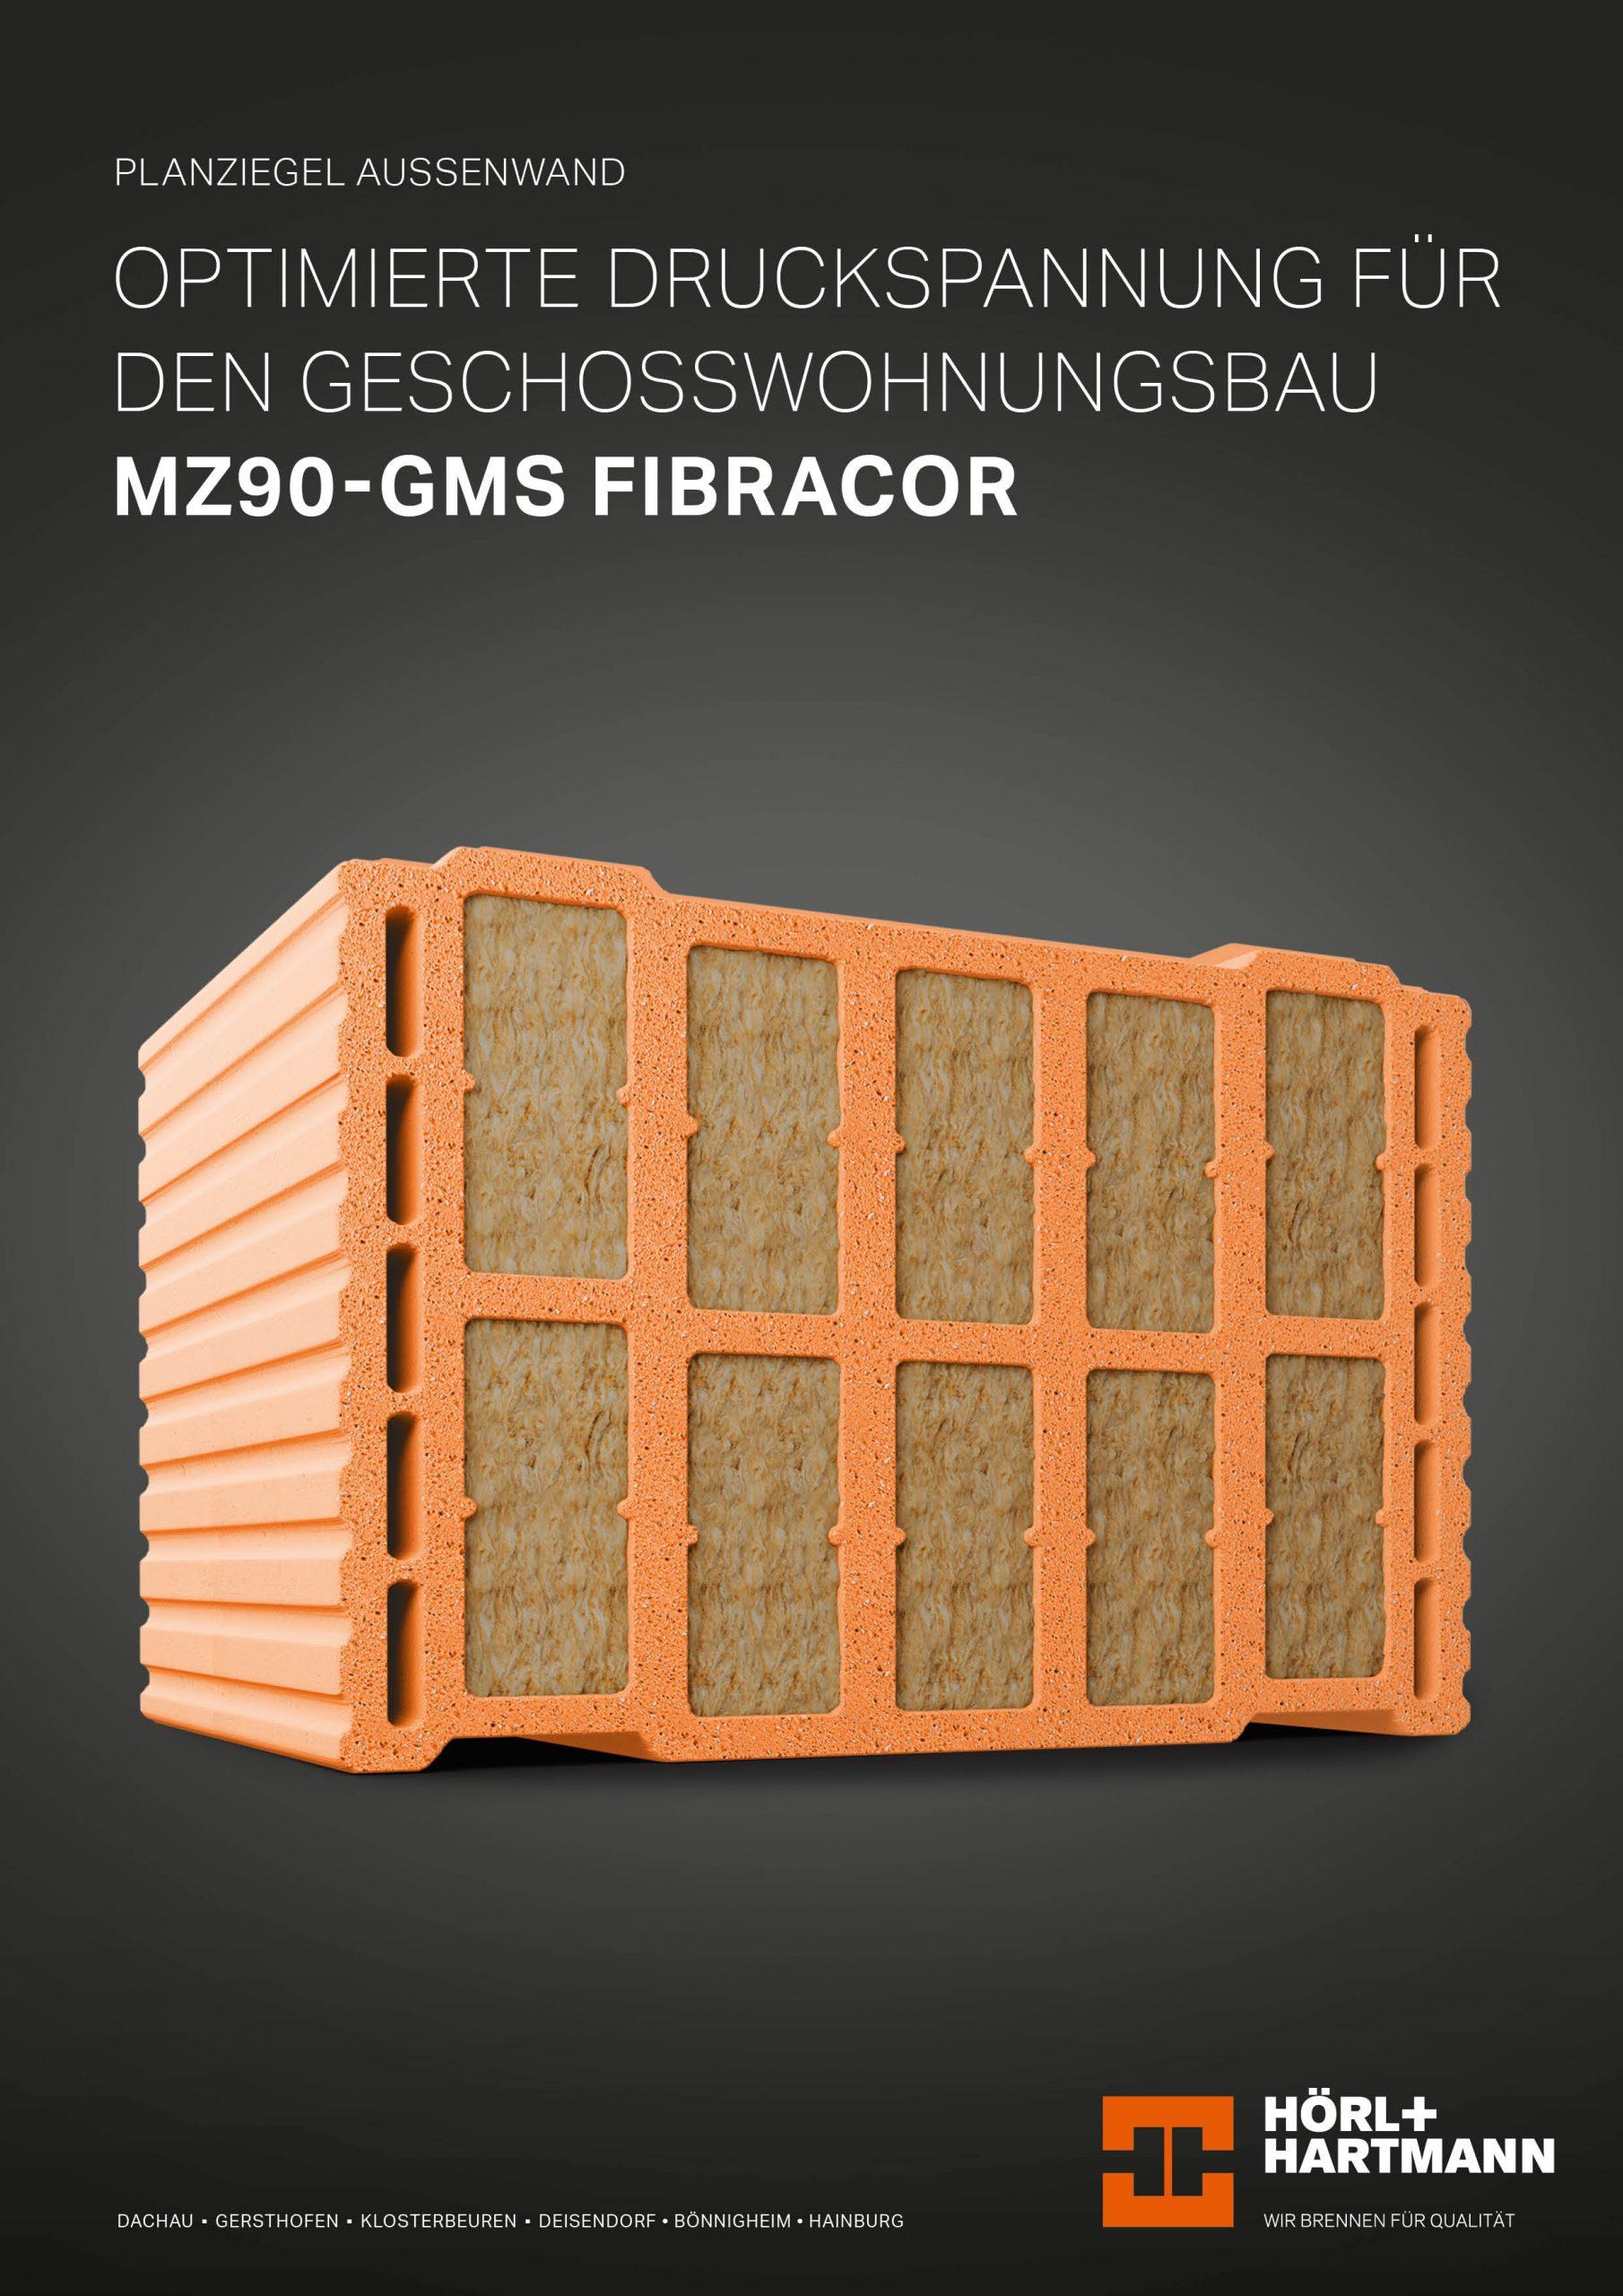 Datenblatt MZ90-GMS FIBRACOR